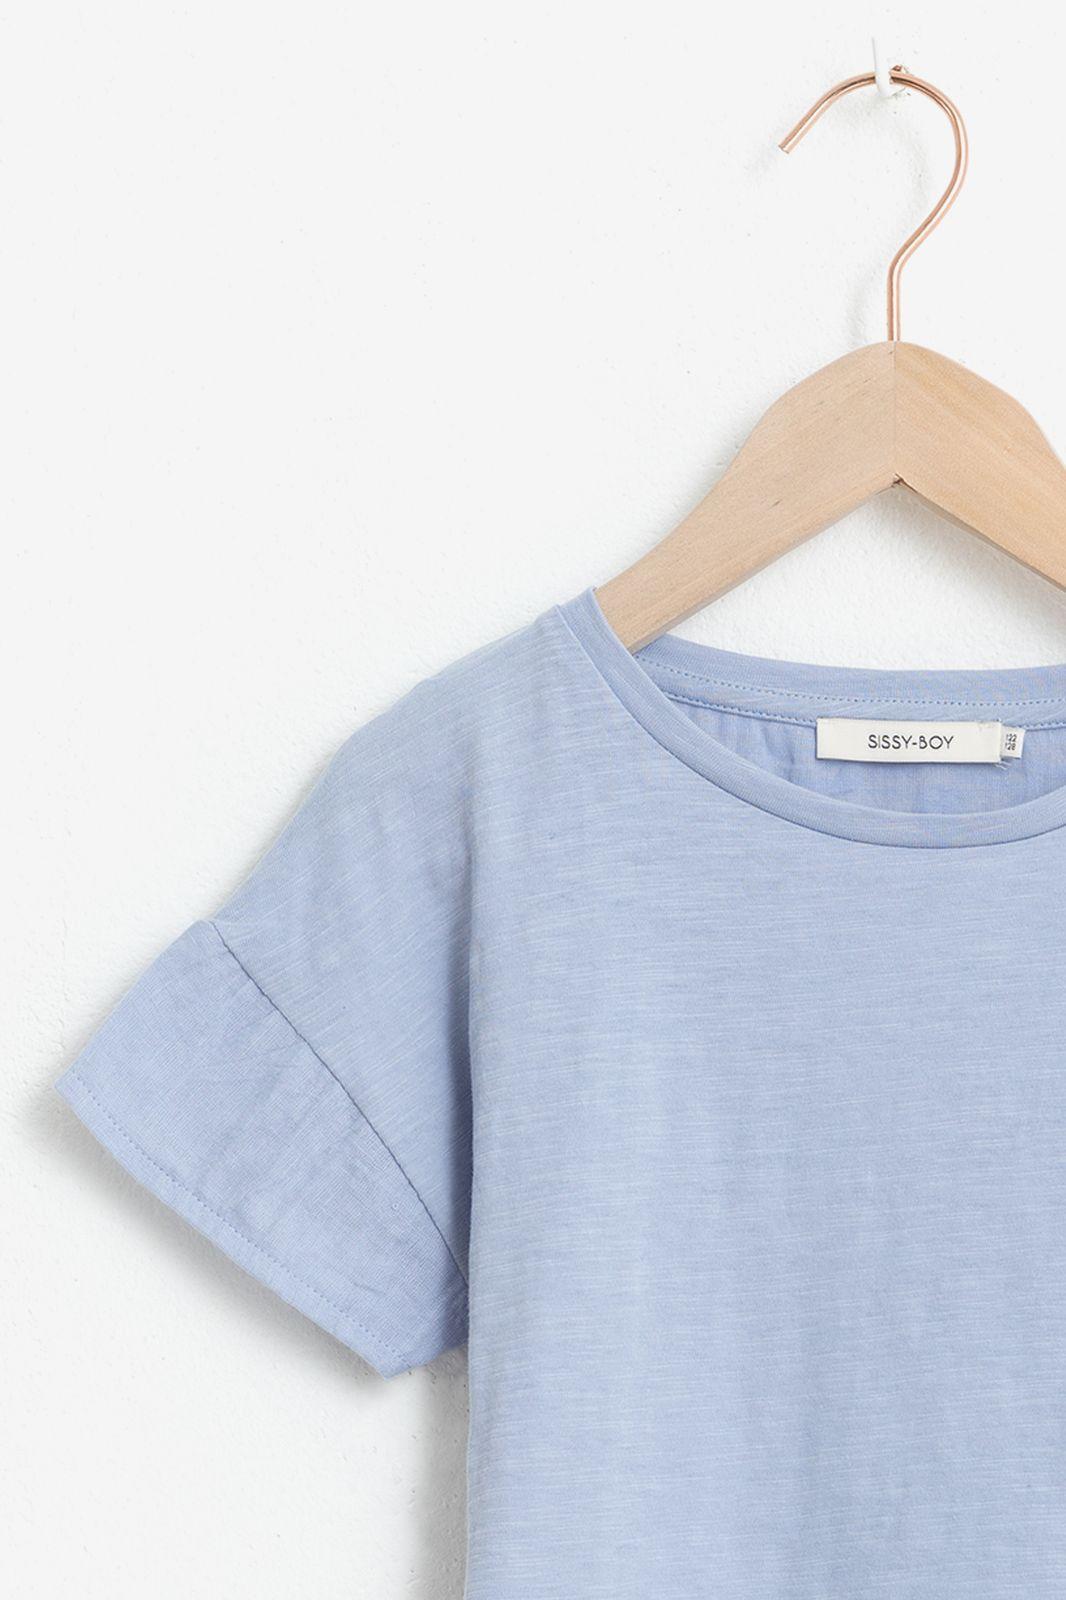 Blauw T-shirt met korte ruffle mouwen